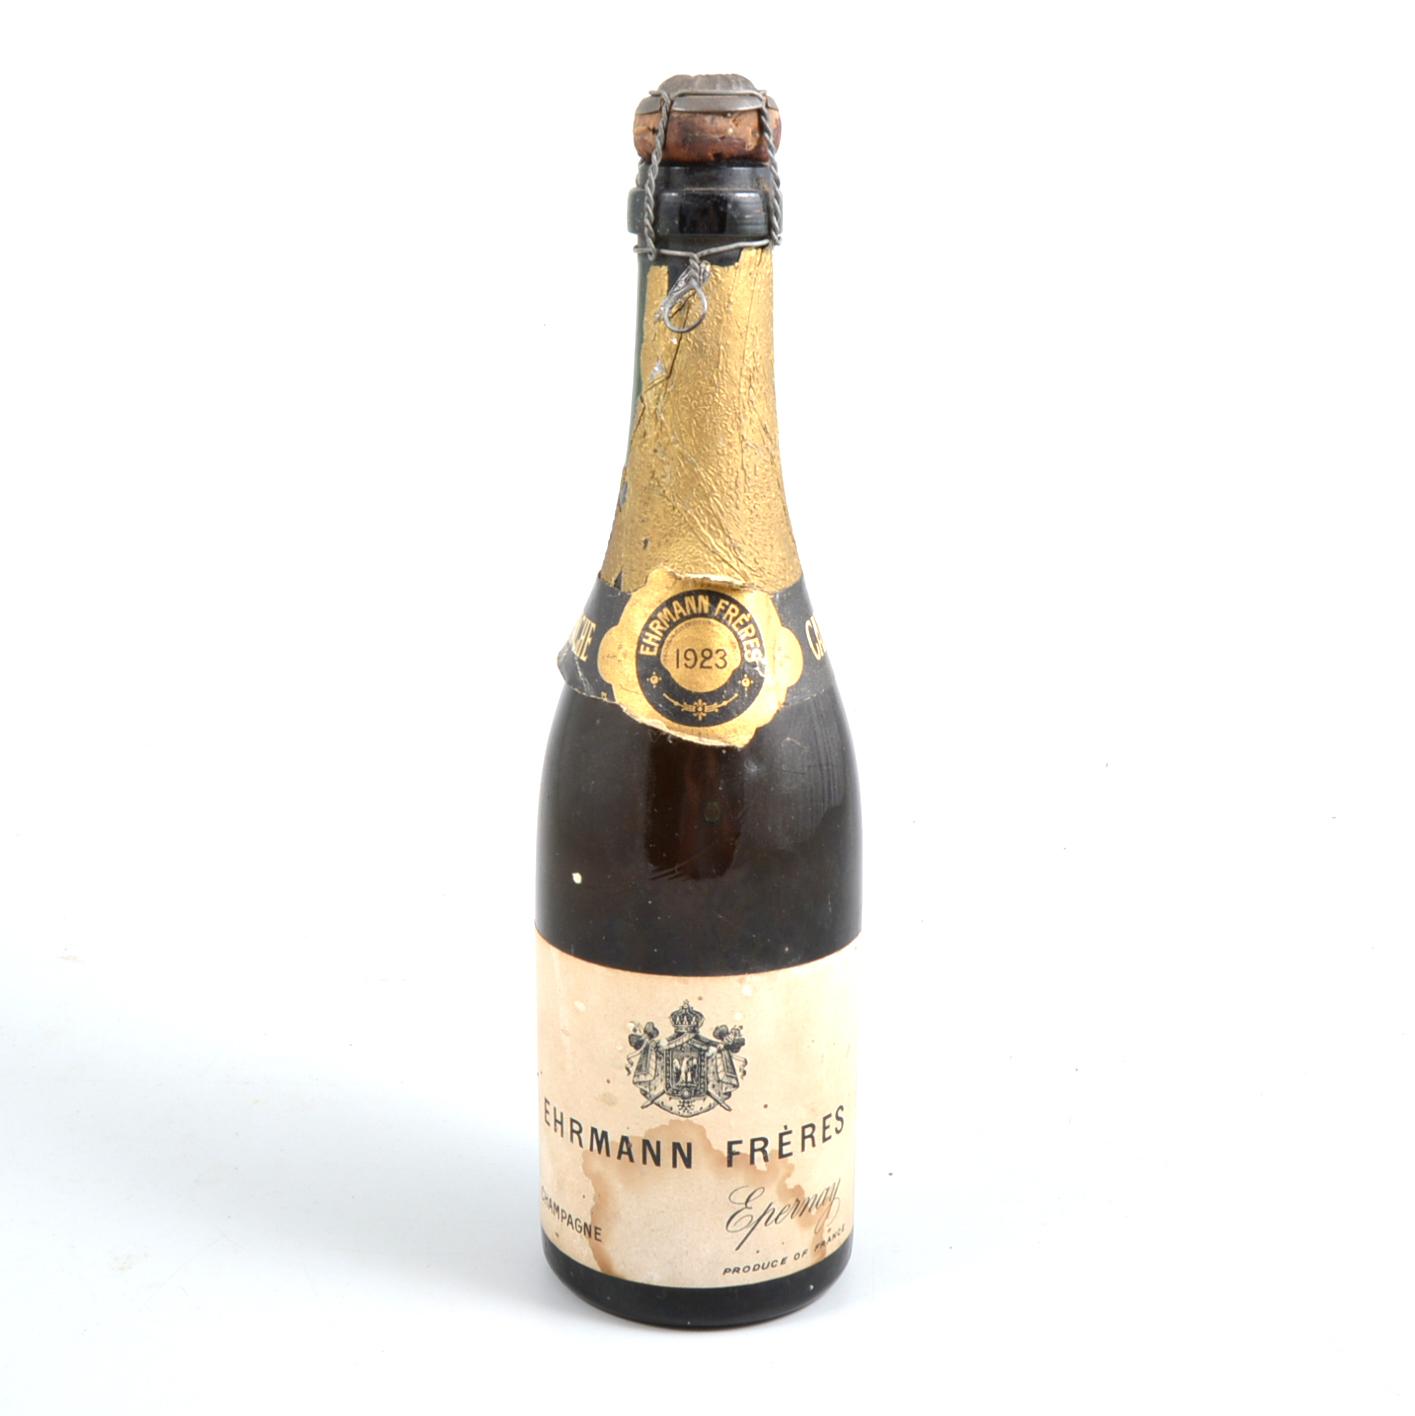 Lot 163 - Ehrmann Freres, Epernay, 1923, Champagne, half bottle.